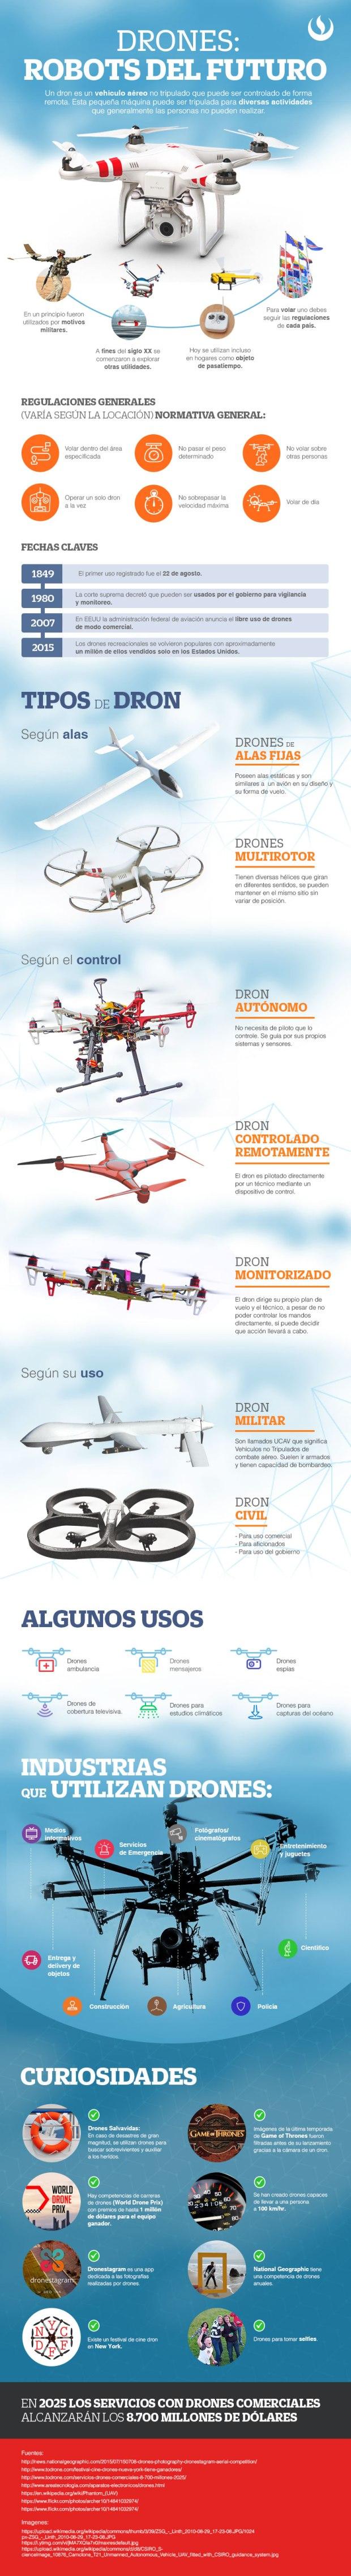 infografia-drones